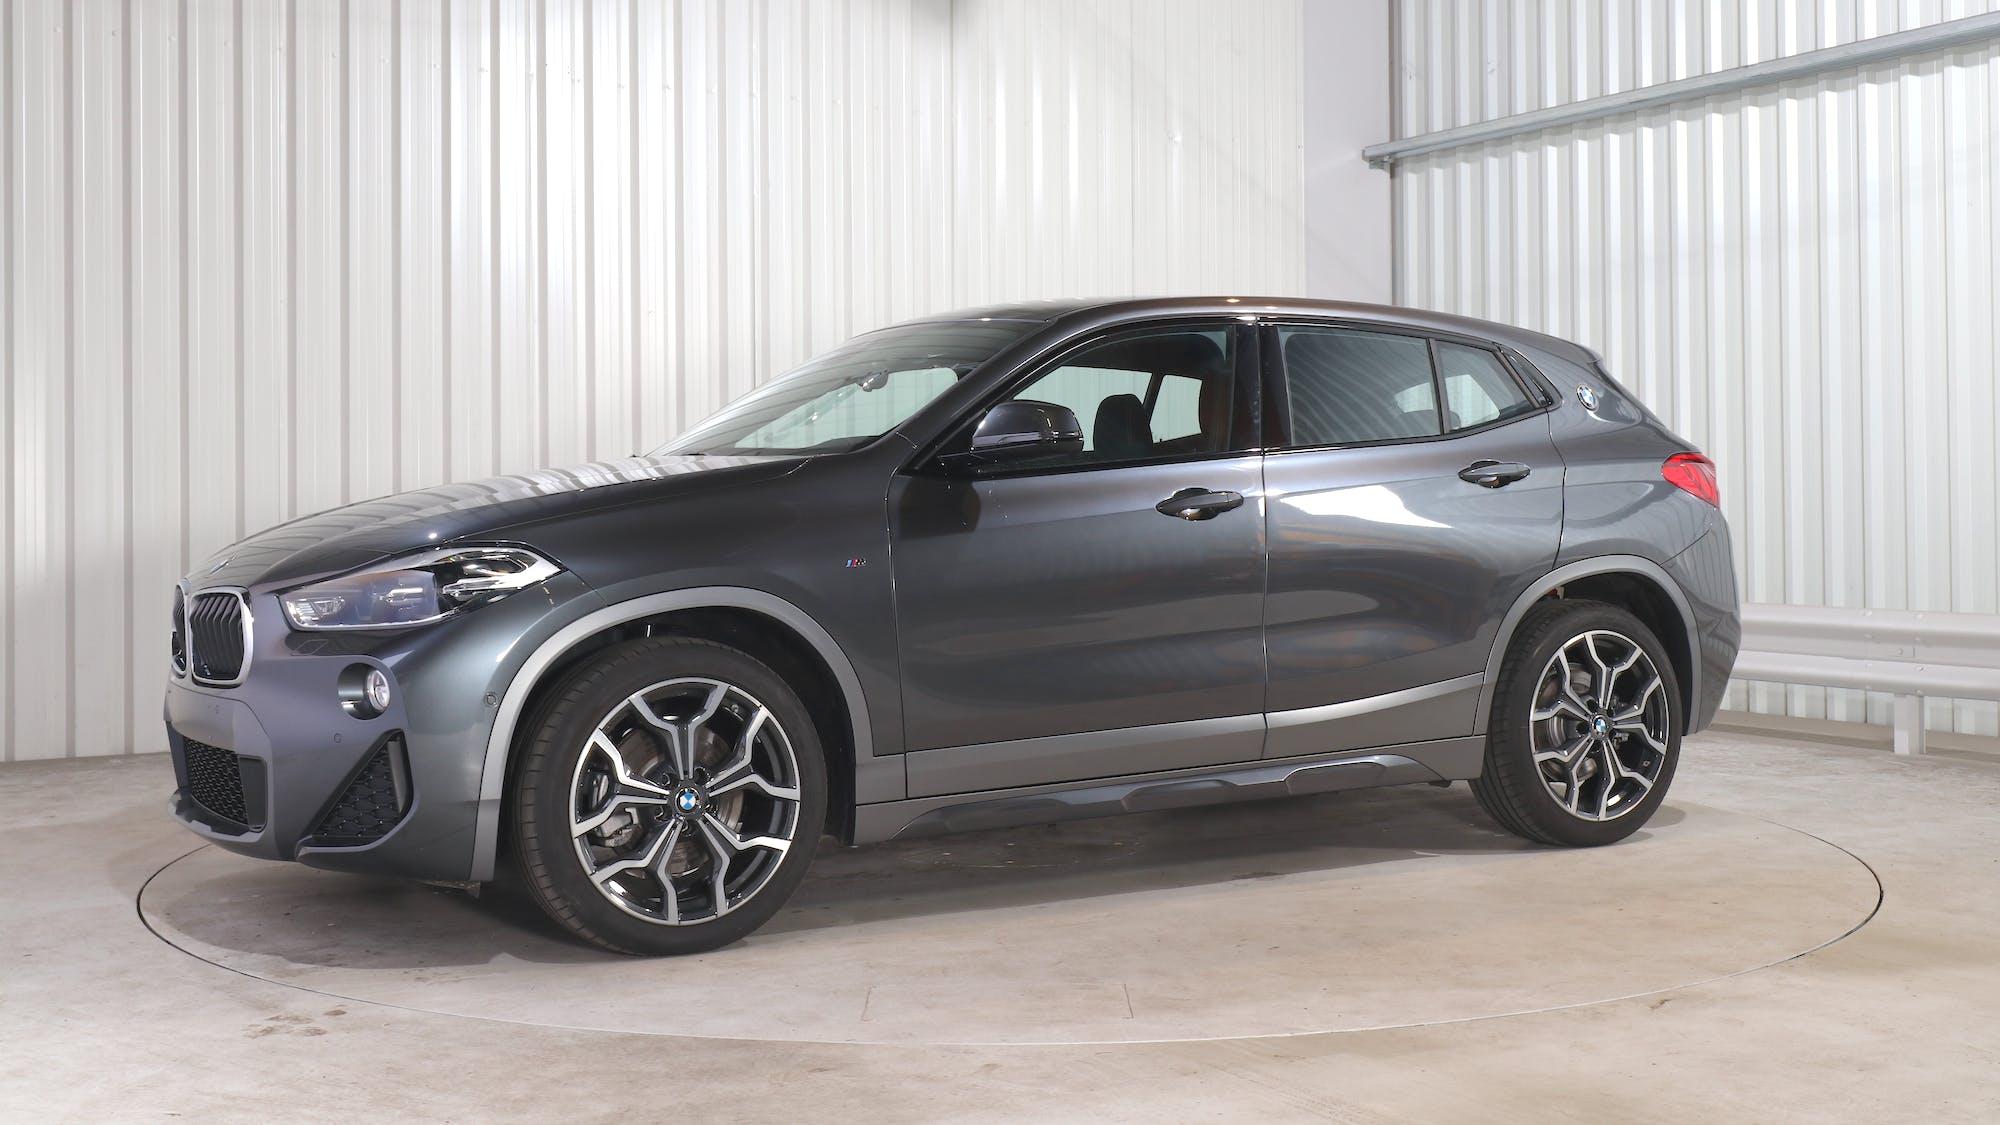 BMW X2 (F39) leasing exterior 1